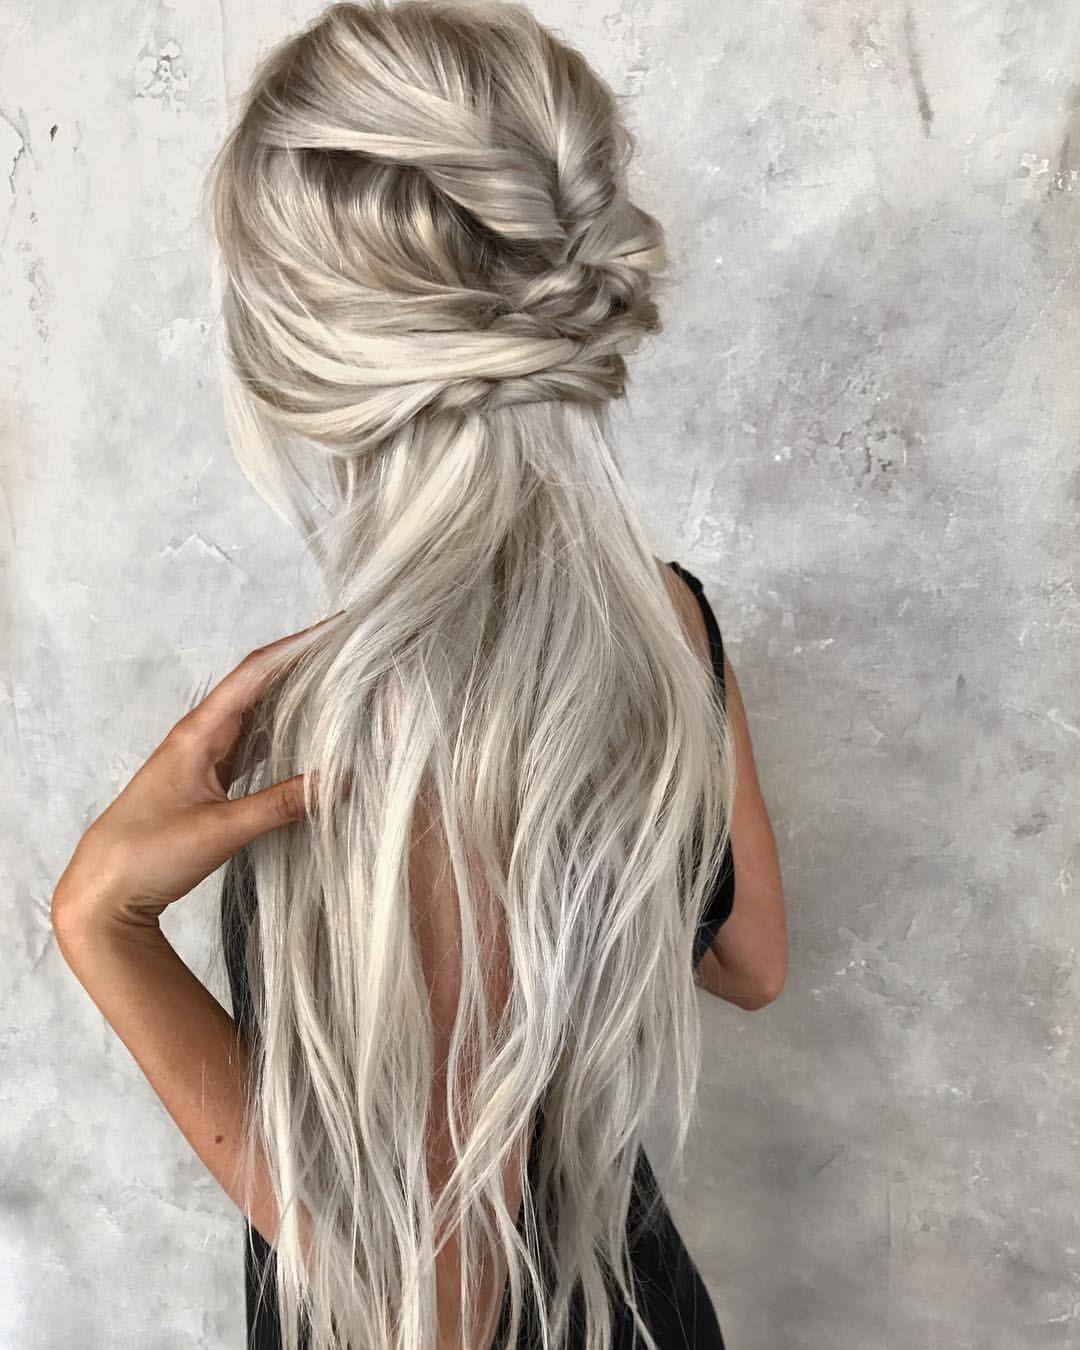 Hair Inspiration 2019-04-15 22:11:52